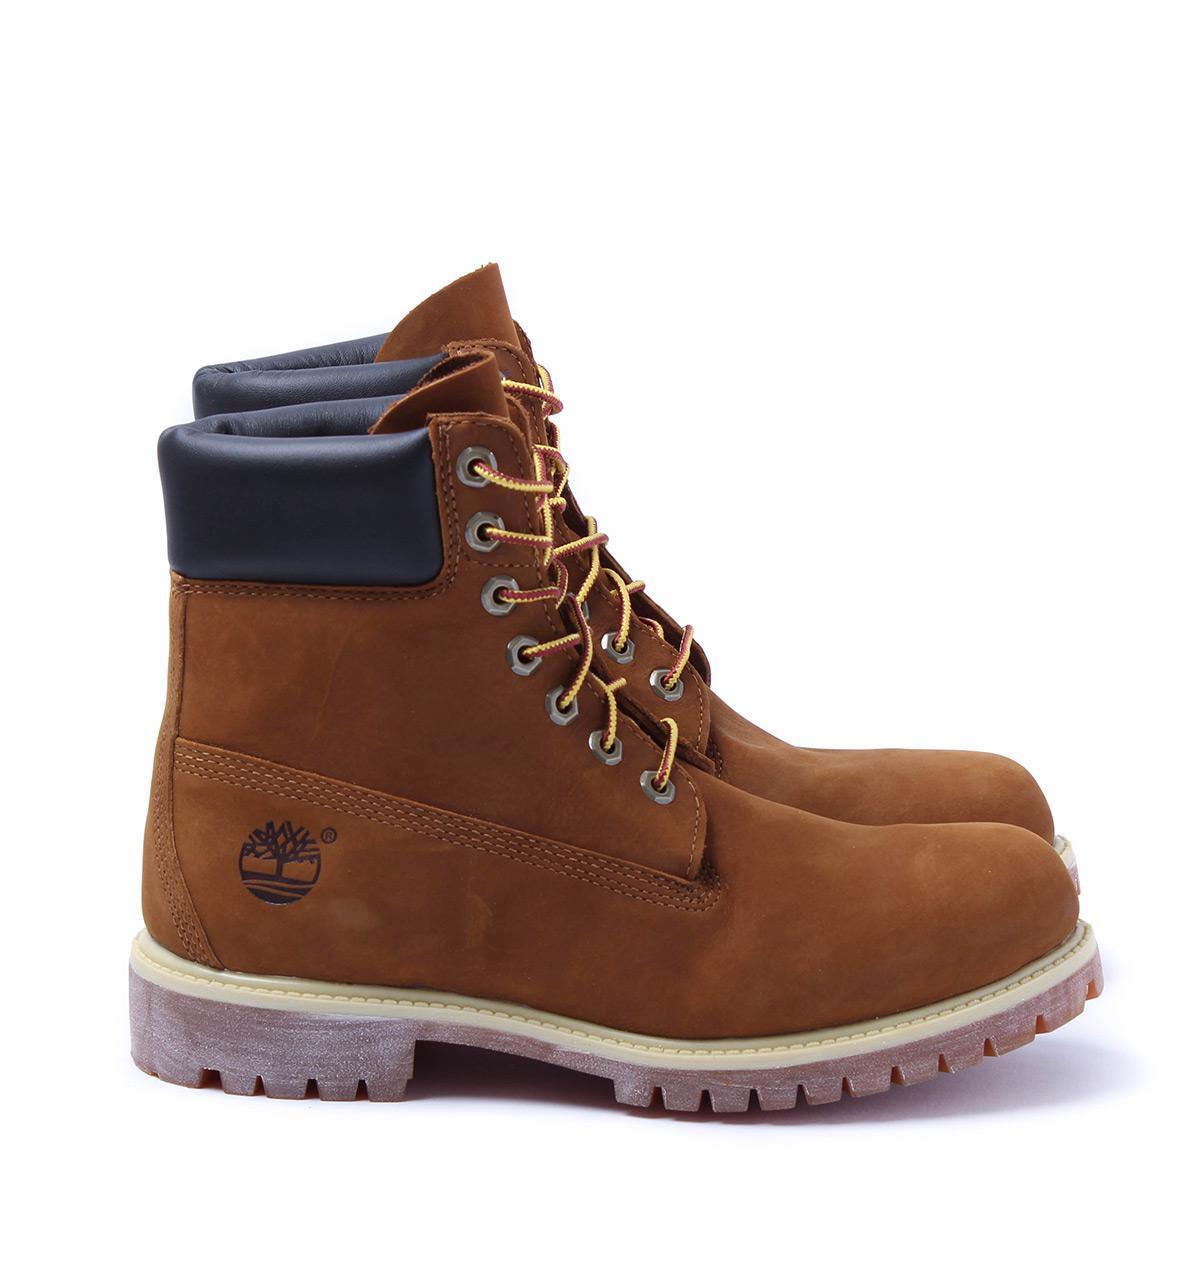 52f1de2cad6f Lyst - Timberland Rust Nubuck 6-inch Premium Waterproof Boots in ...